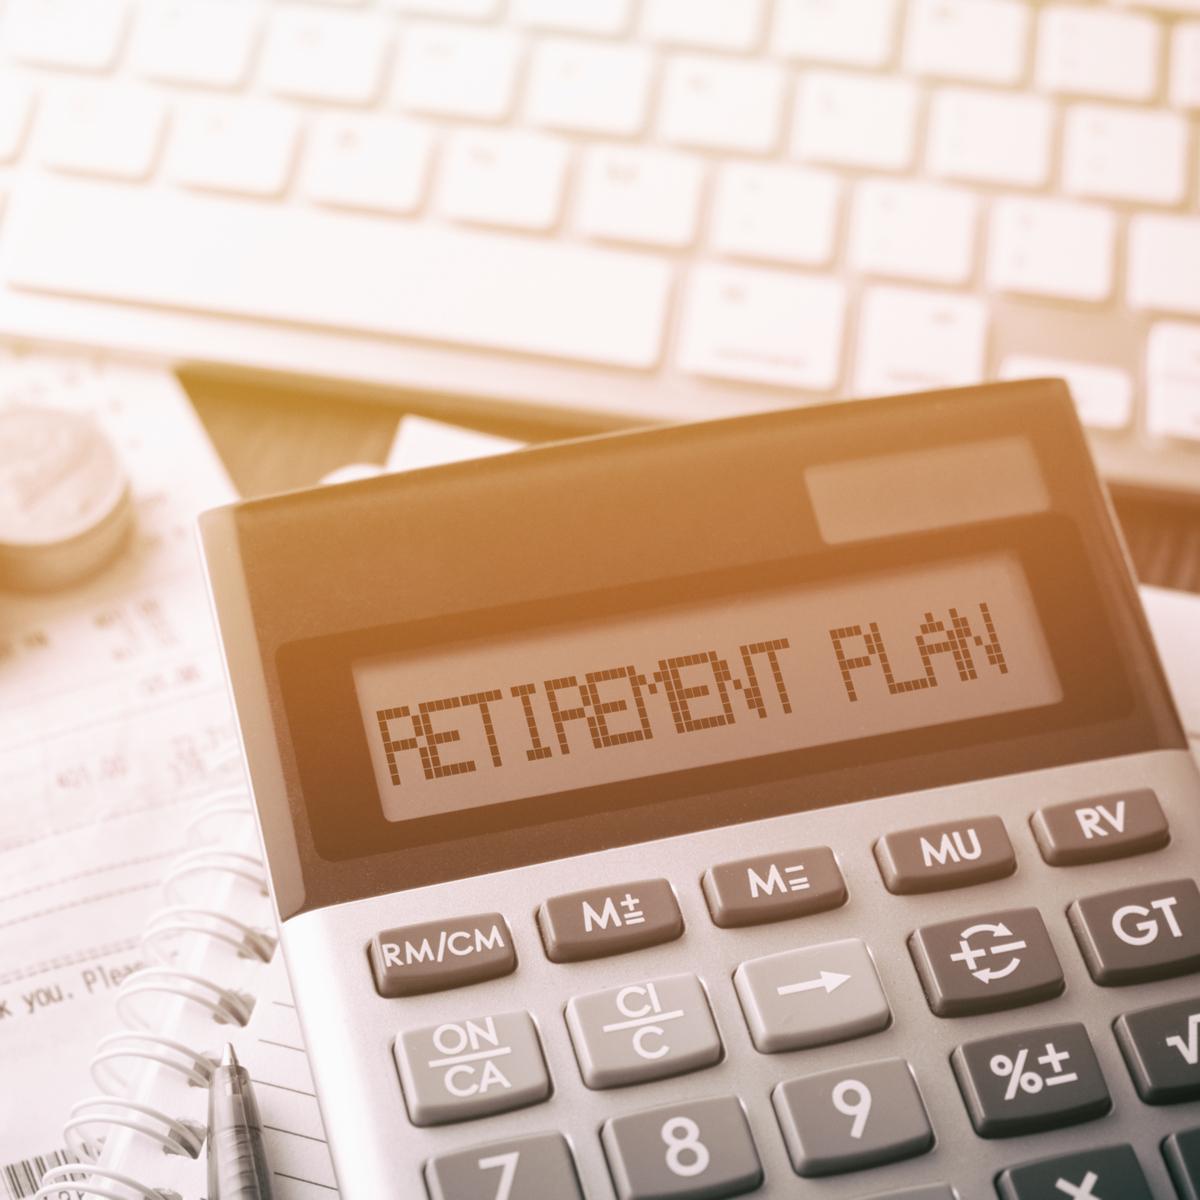 Step 4: Guide You Through Scenarios Little Rock, AR NetWorth Financial